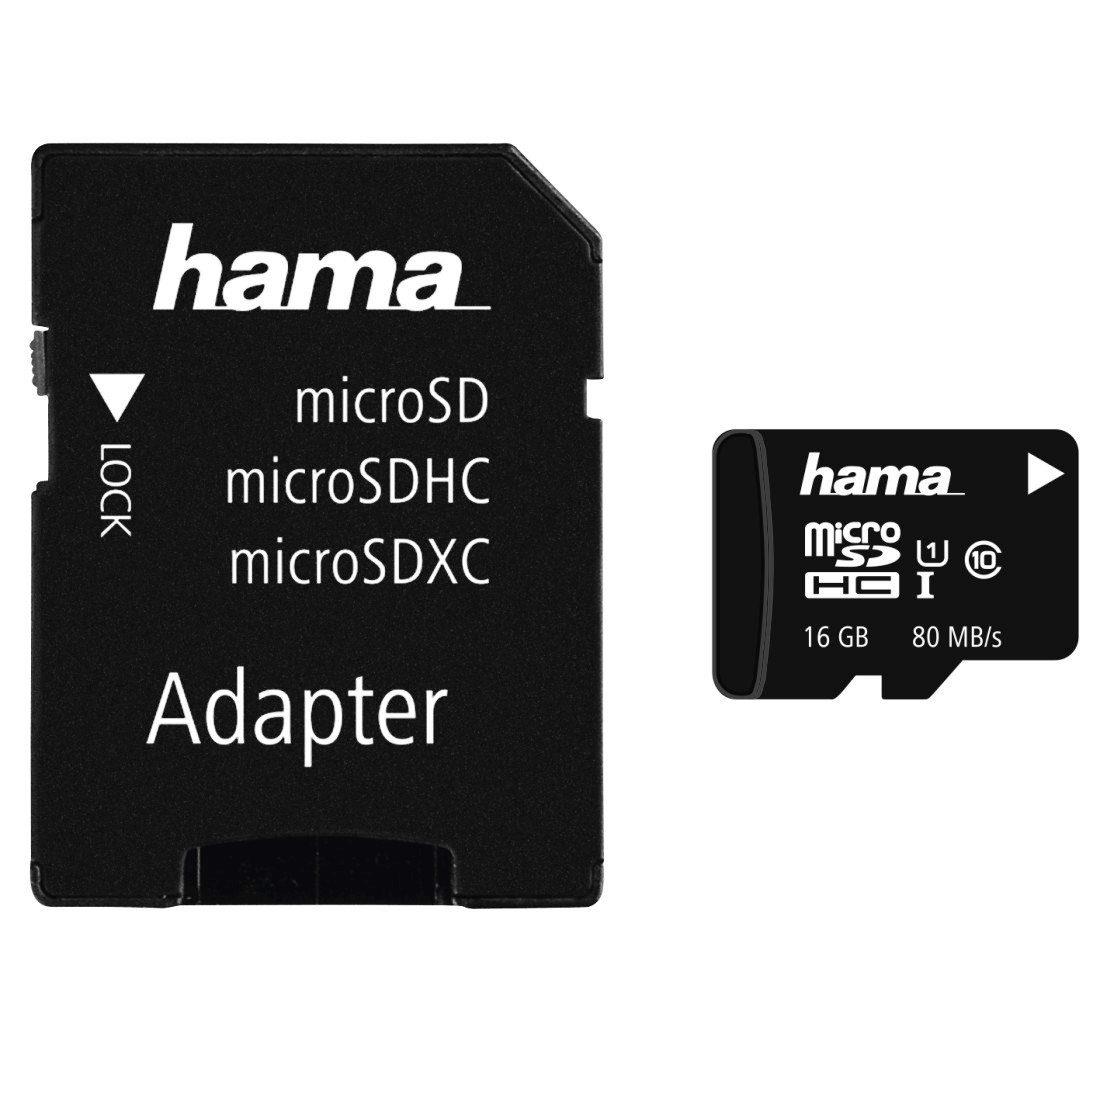 Hama Speicherkarte microSDHC 16GB Class 10 UHS-I 80MB/s »inkl. SD-Karten Adapter«